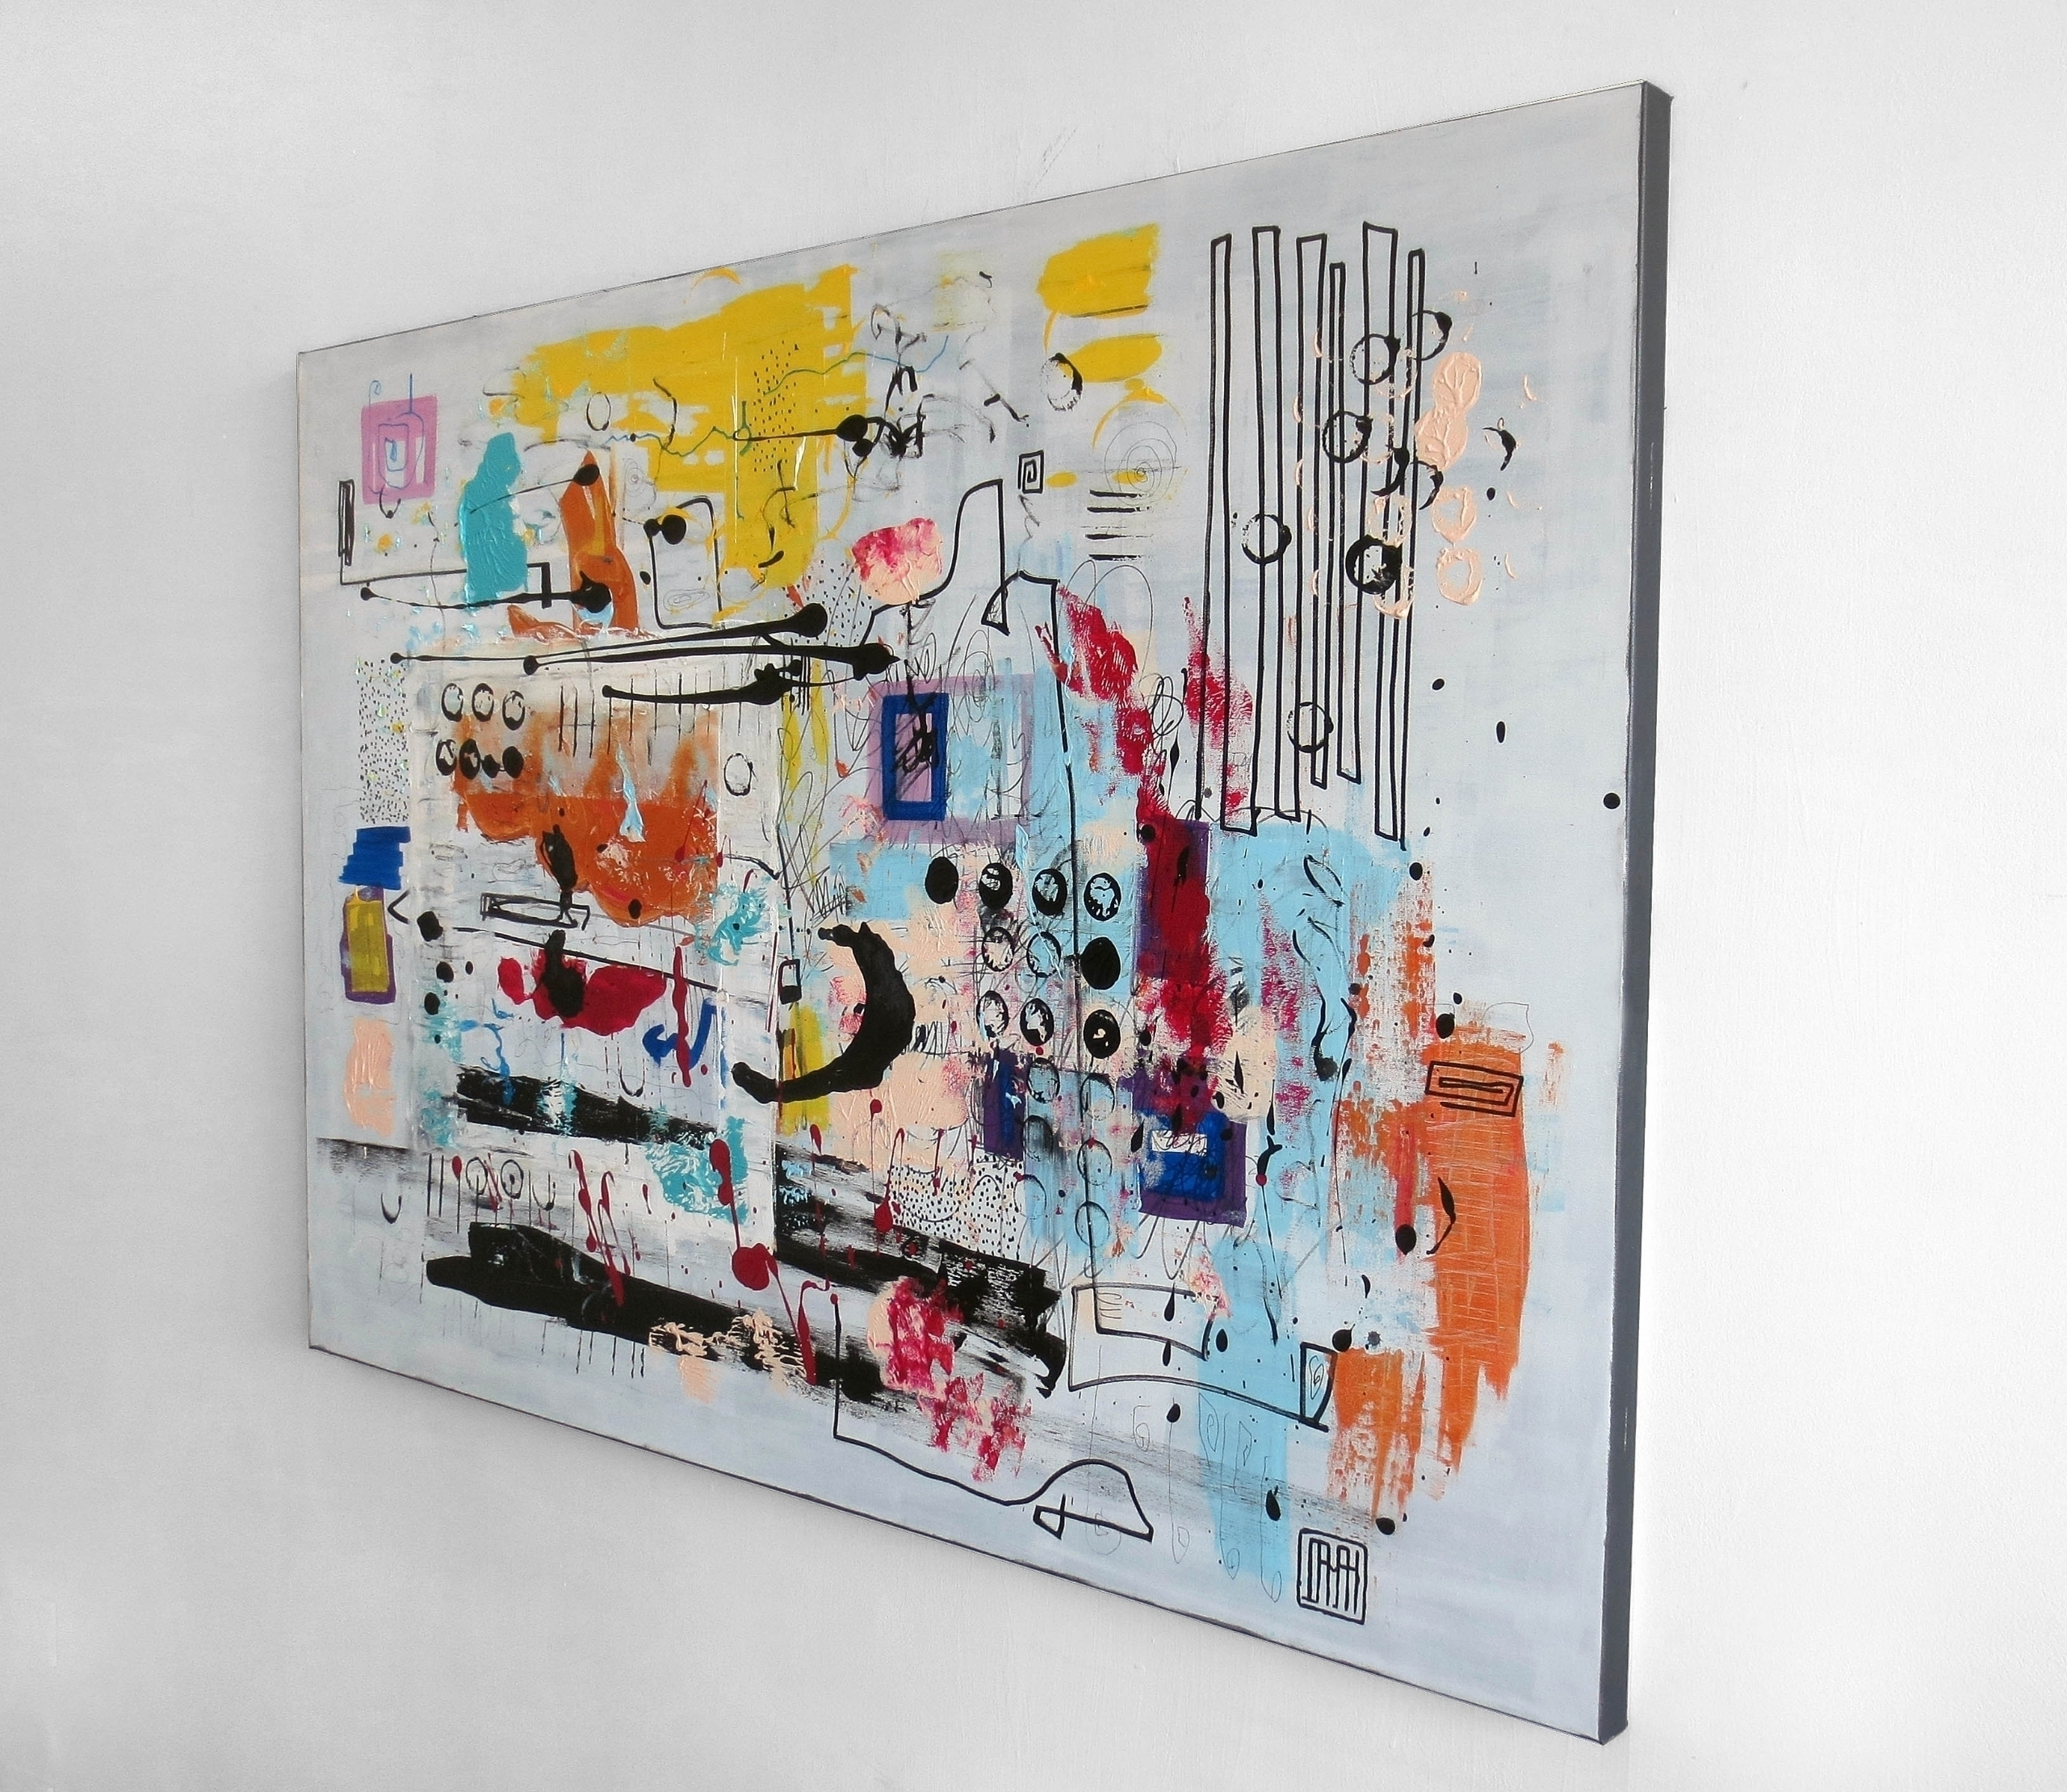 sold A89 acrylic canvas 100x140 - damianpavlovic | ello